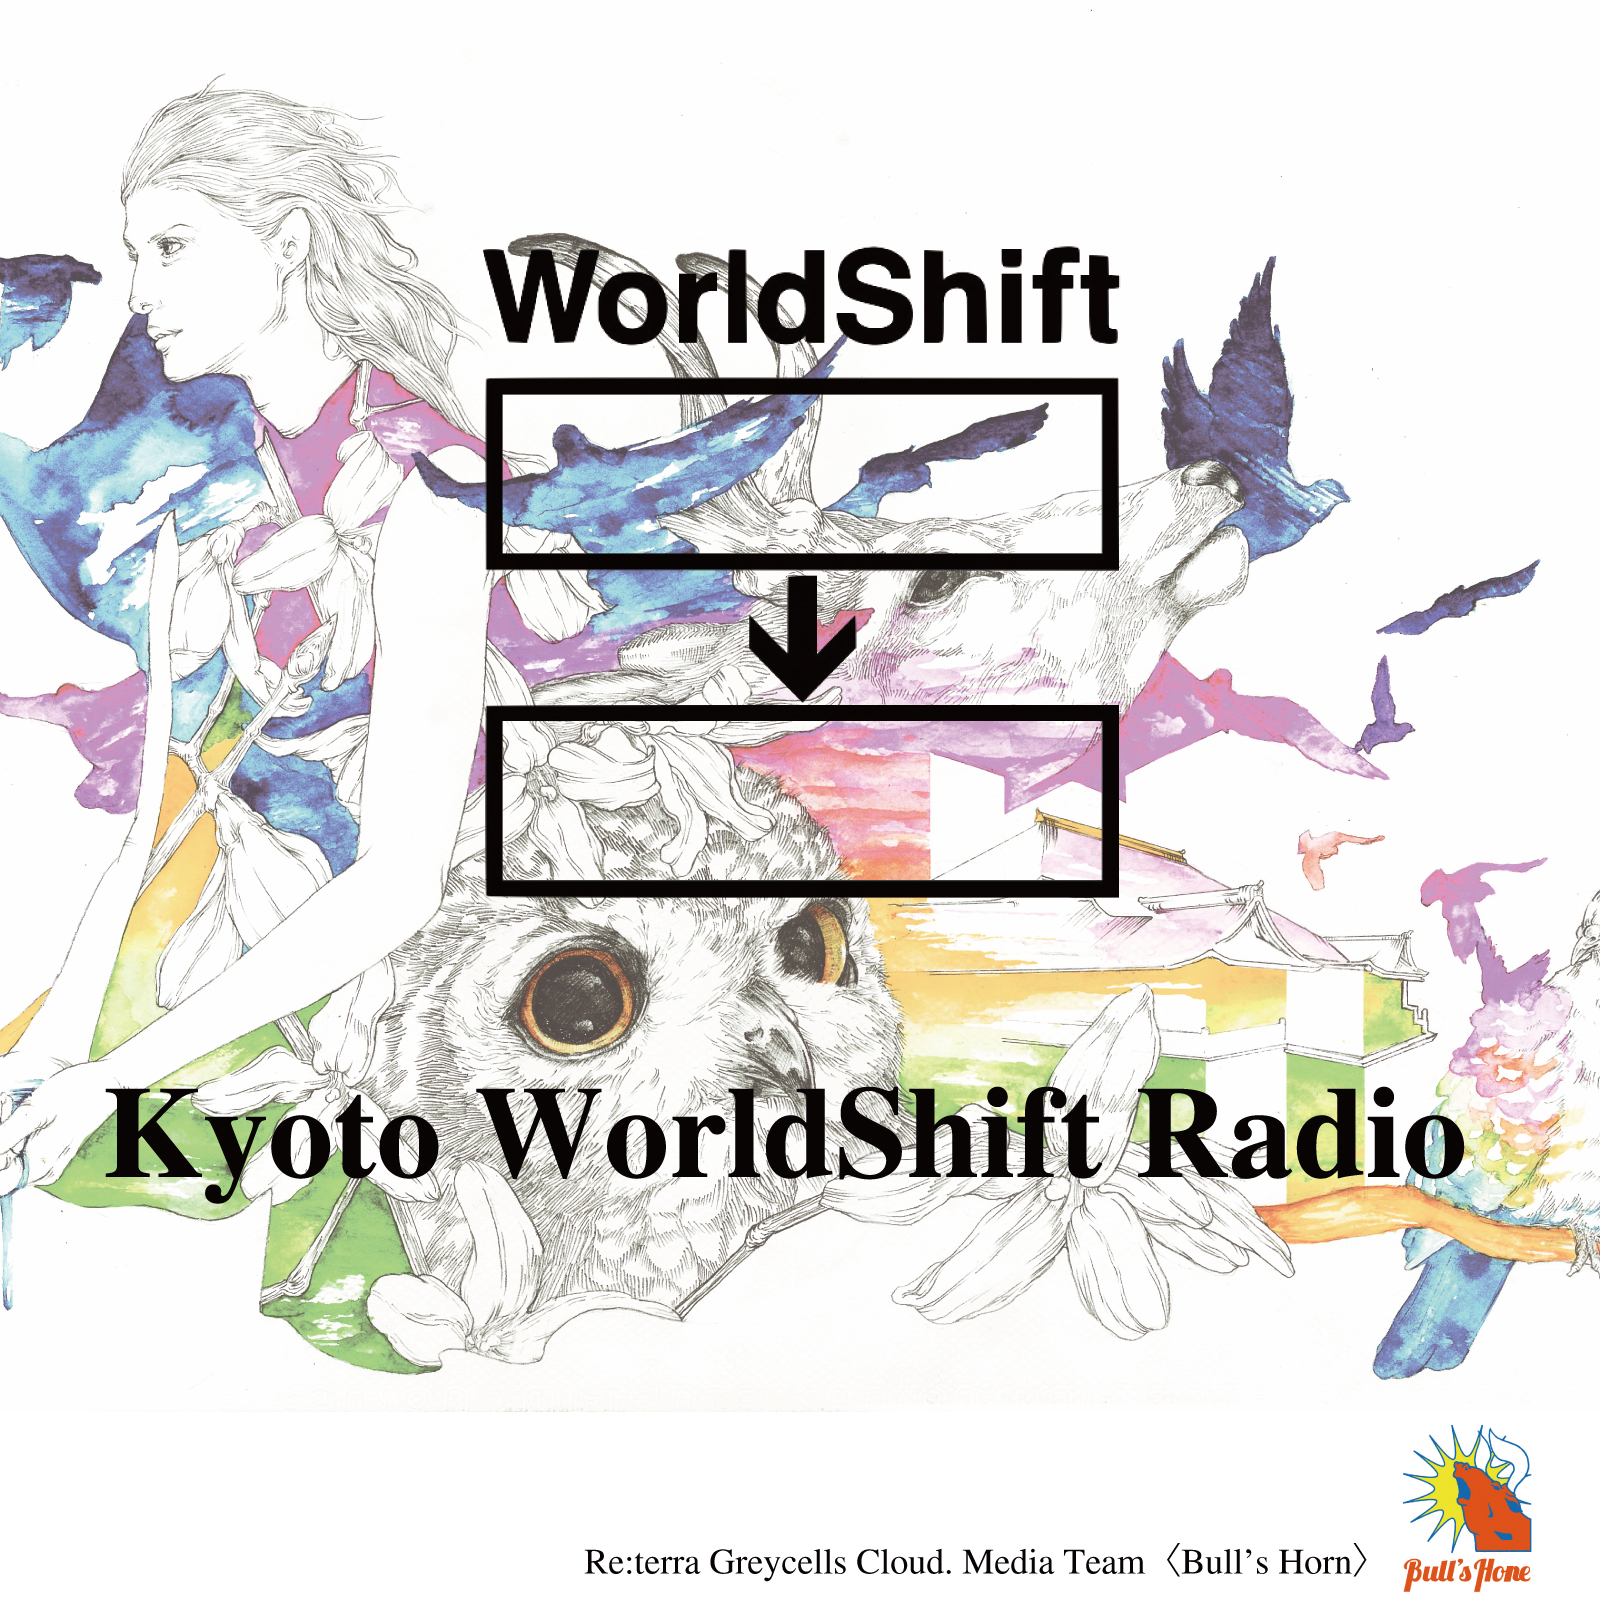 Kyoto WorldShift Radio - FM79.7MHz京都三条ラジオカフェ:放送